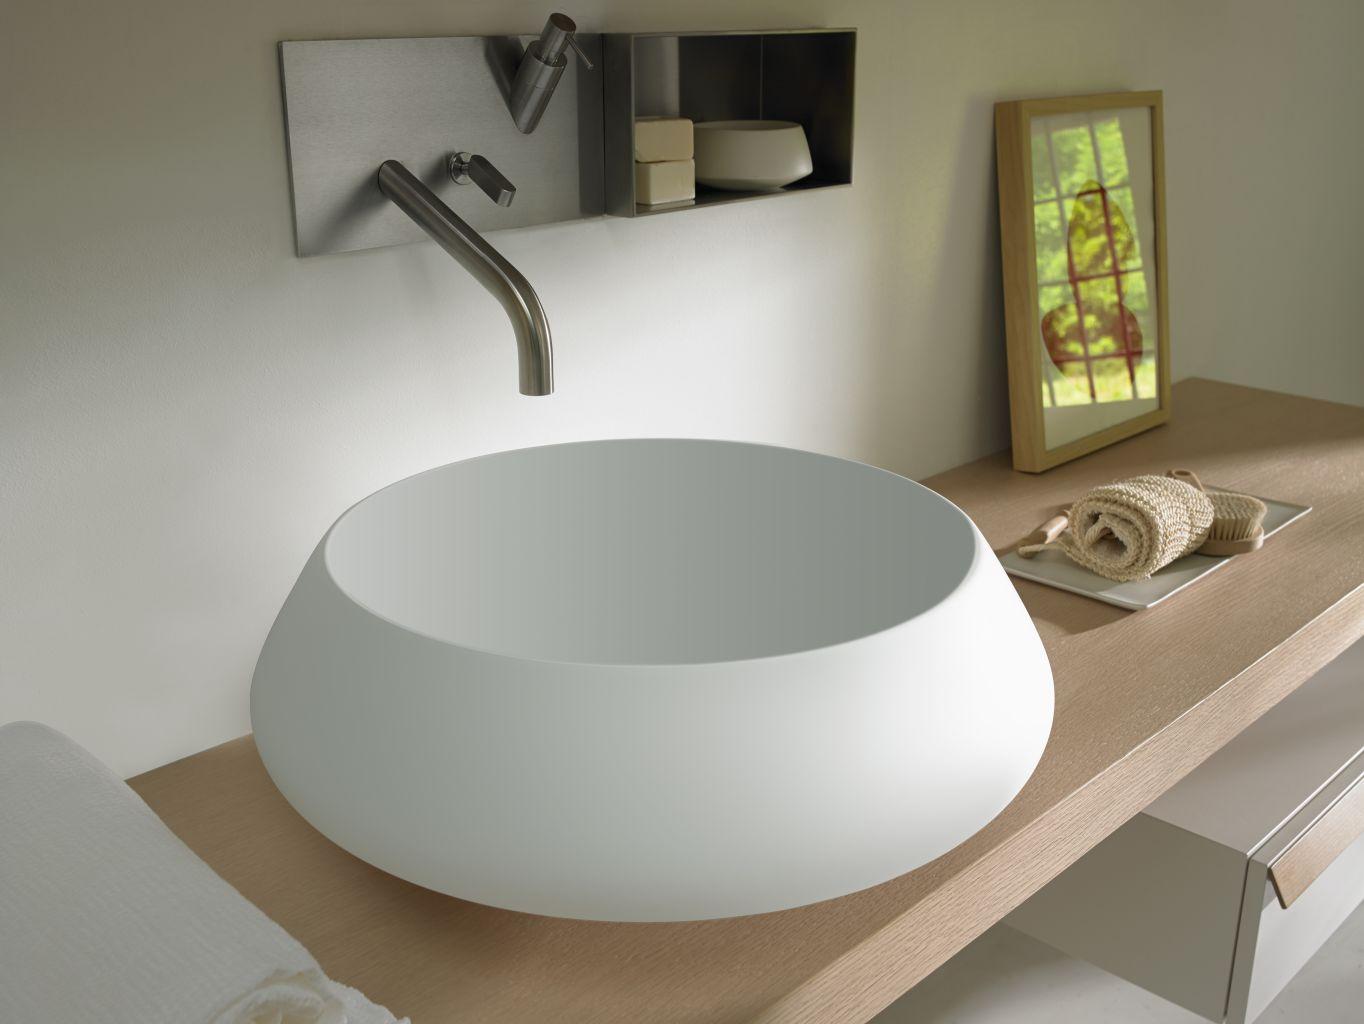 Product Image Bjohn 2 over-counter washbasin